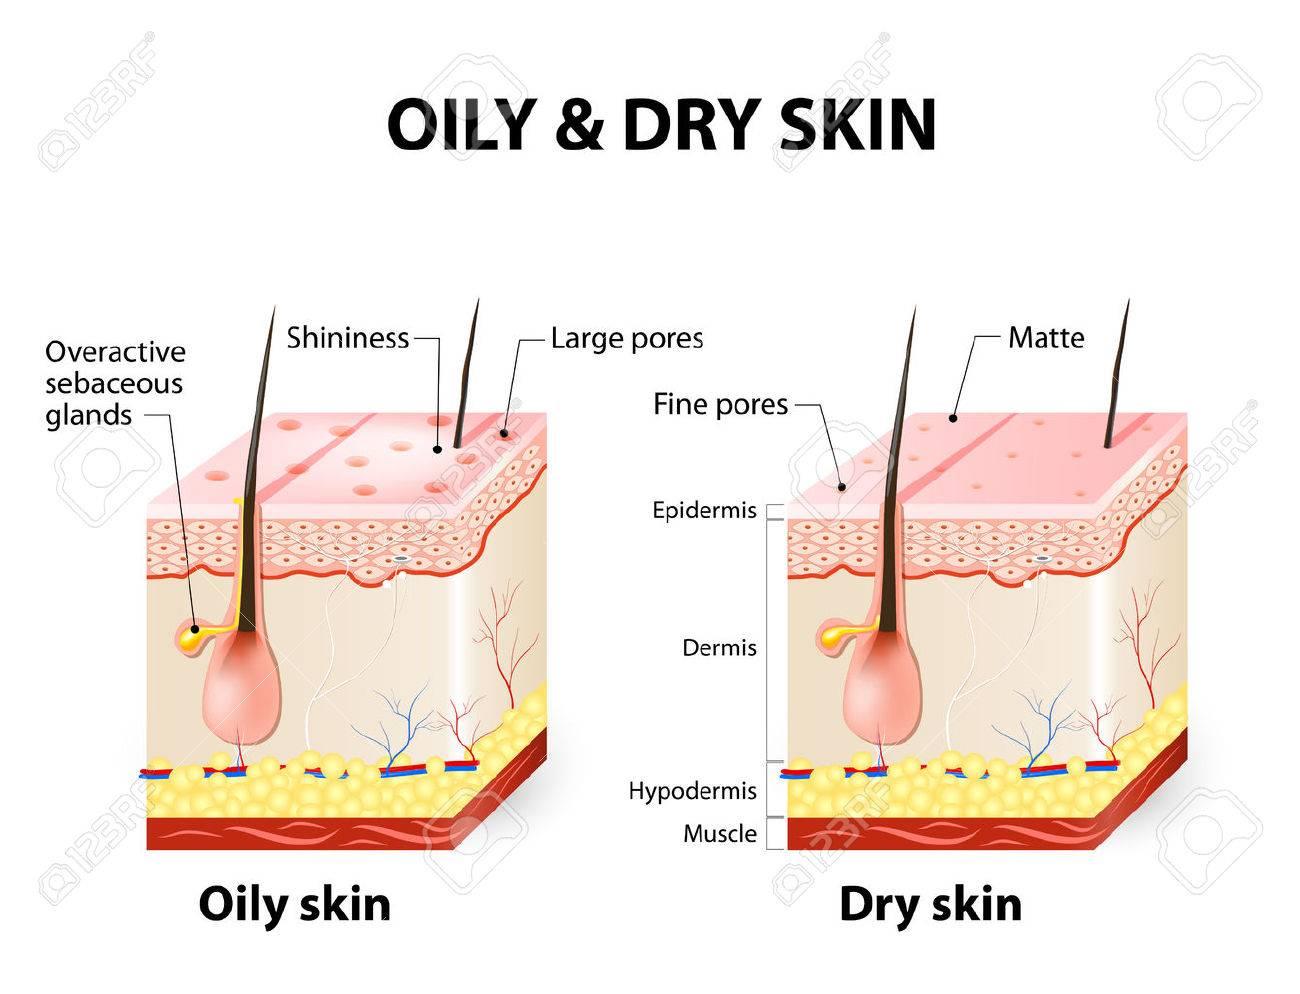 http://n3.datasn.io/data/api/v1/n3zm/image_of_skin_disease_5/main/skin_disease_image_download//7c/e9/19/eb/7ce919eb21d3f9756d1988e8f864bbc049e84af1.jpg